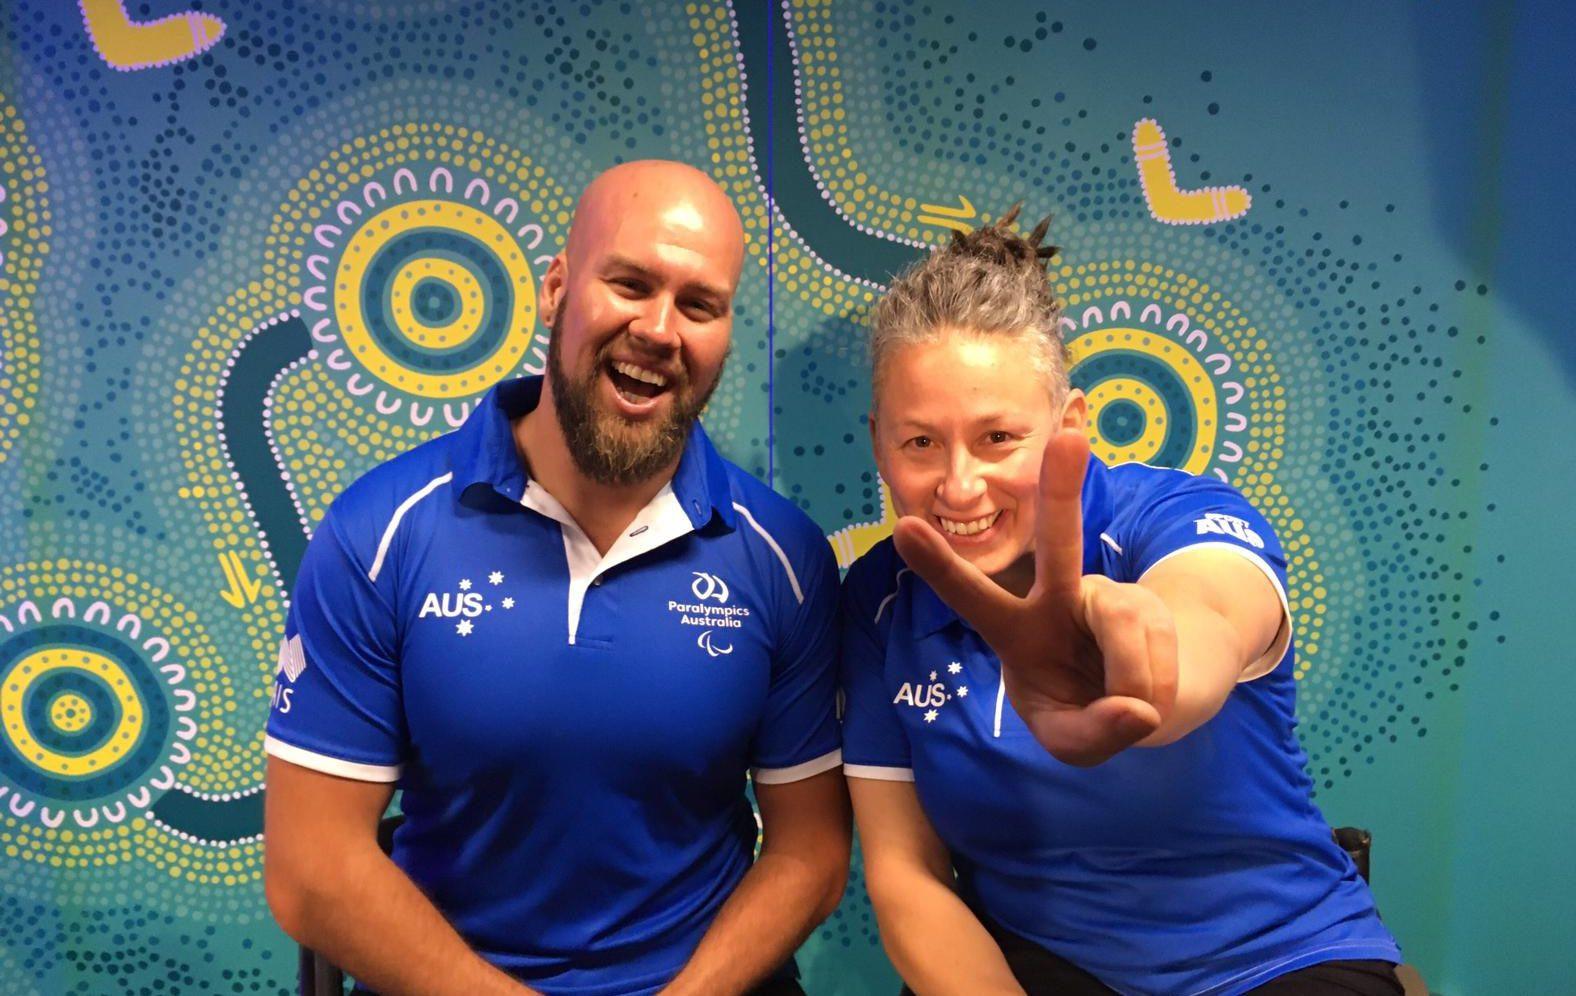 Di Toro and Batt to captain Australia at Tokyo 2020 Paralympic Games